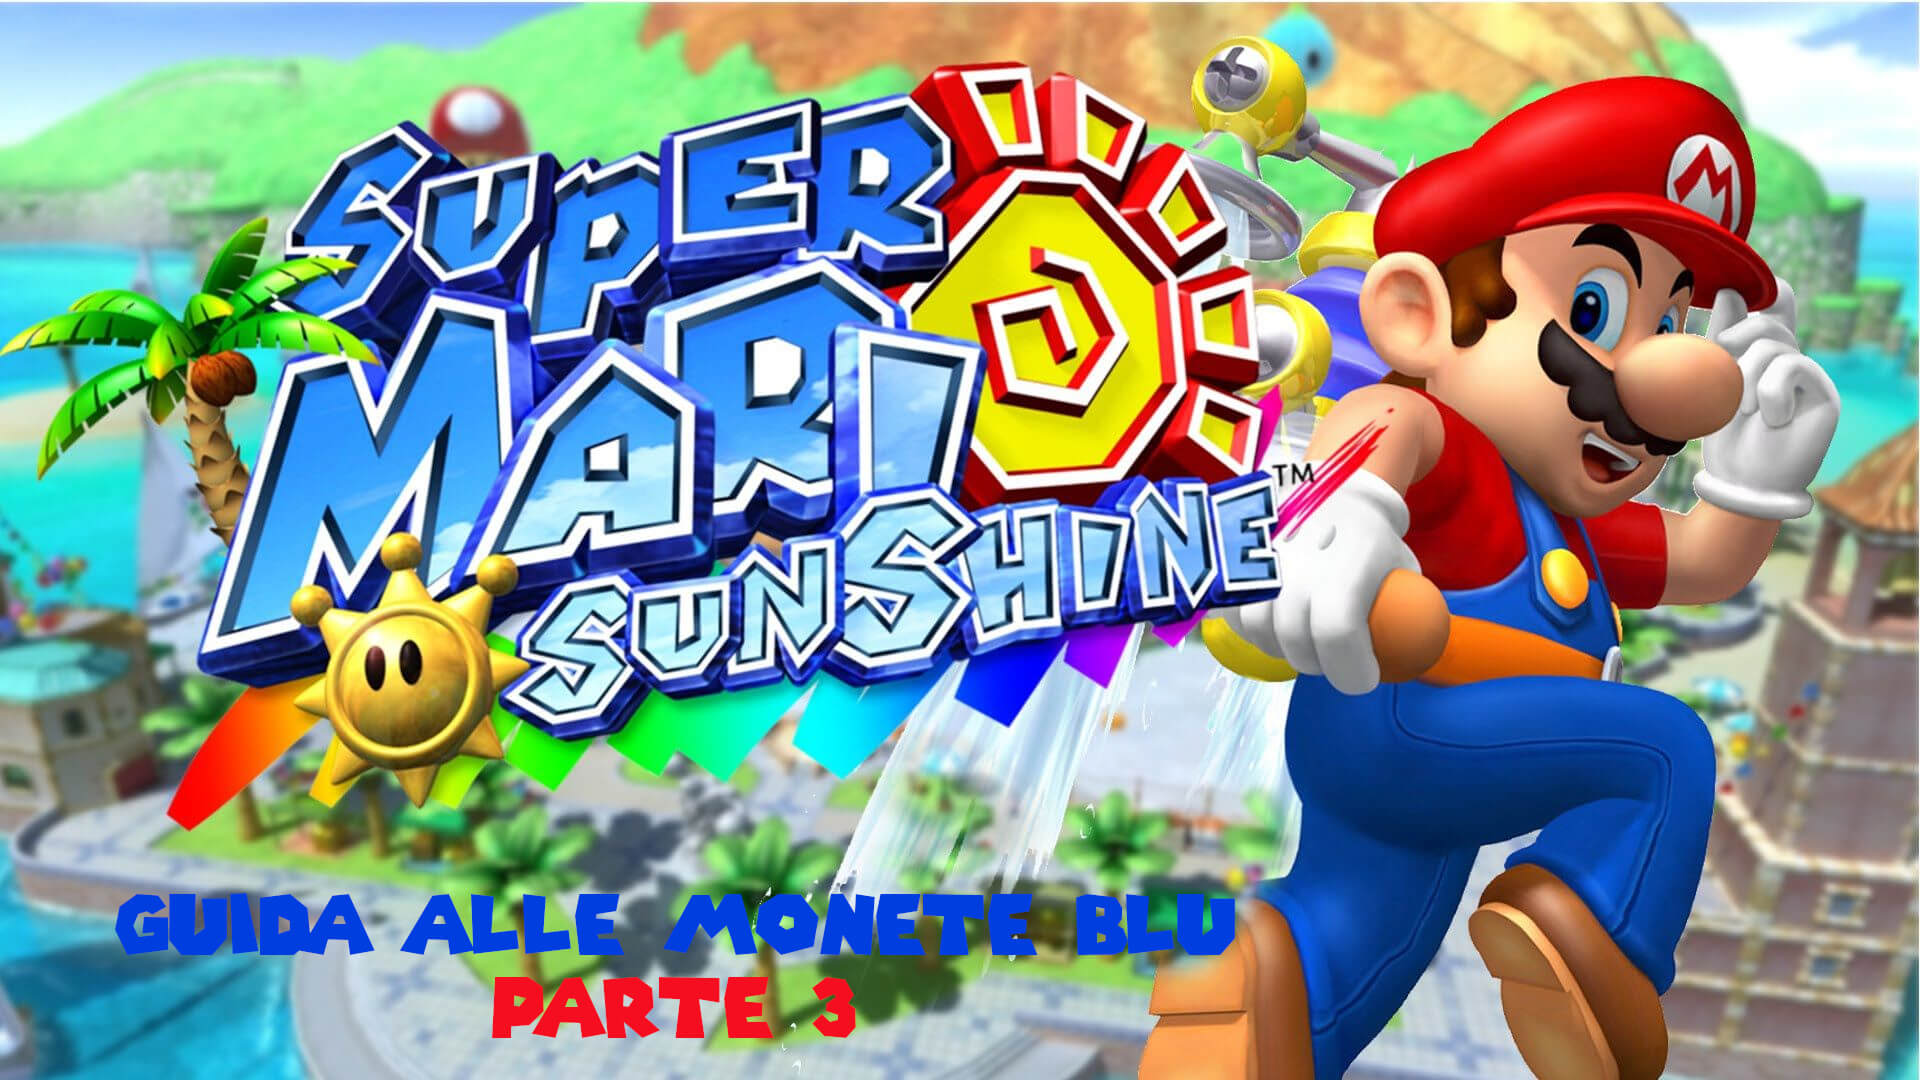 Cover Mario Sunshine Guida 3